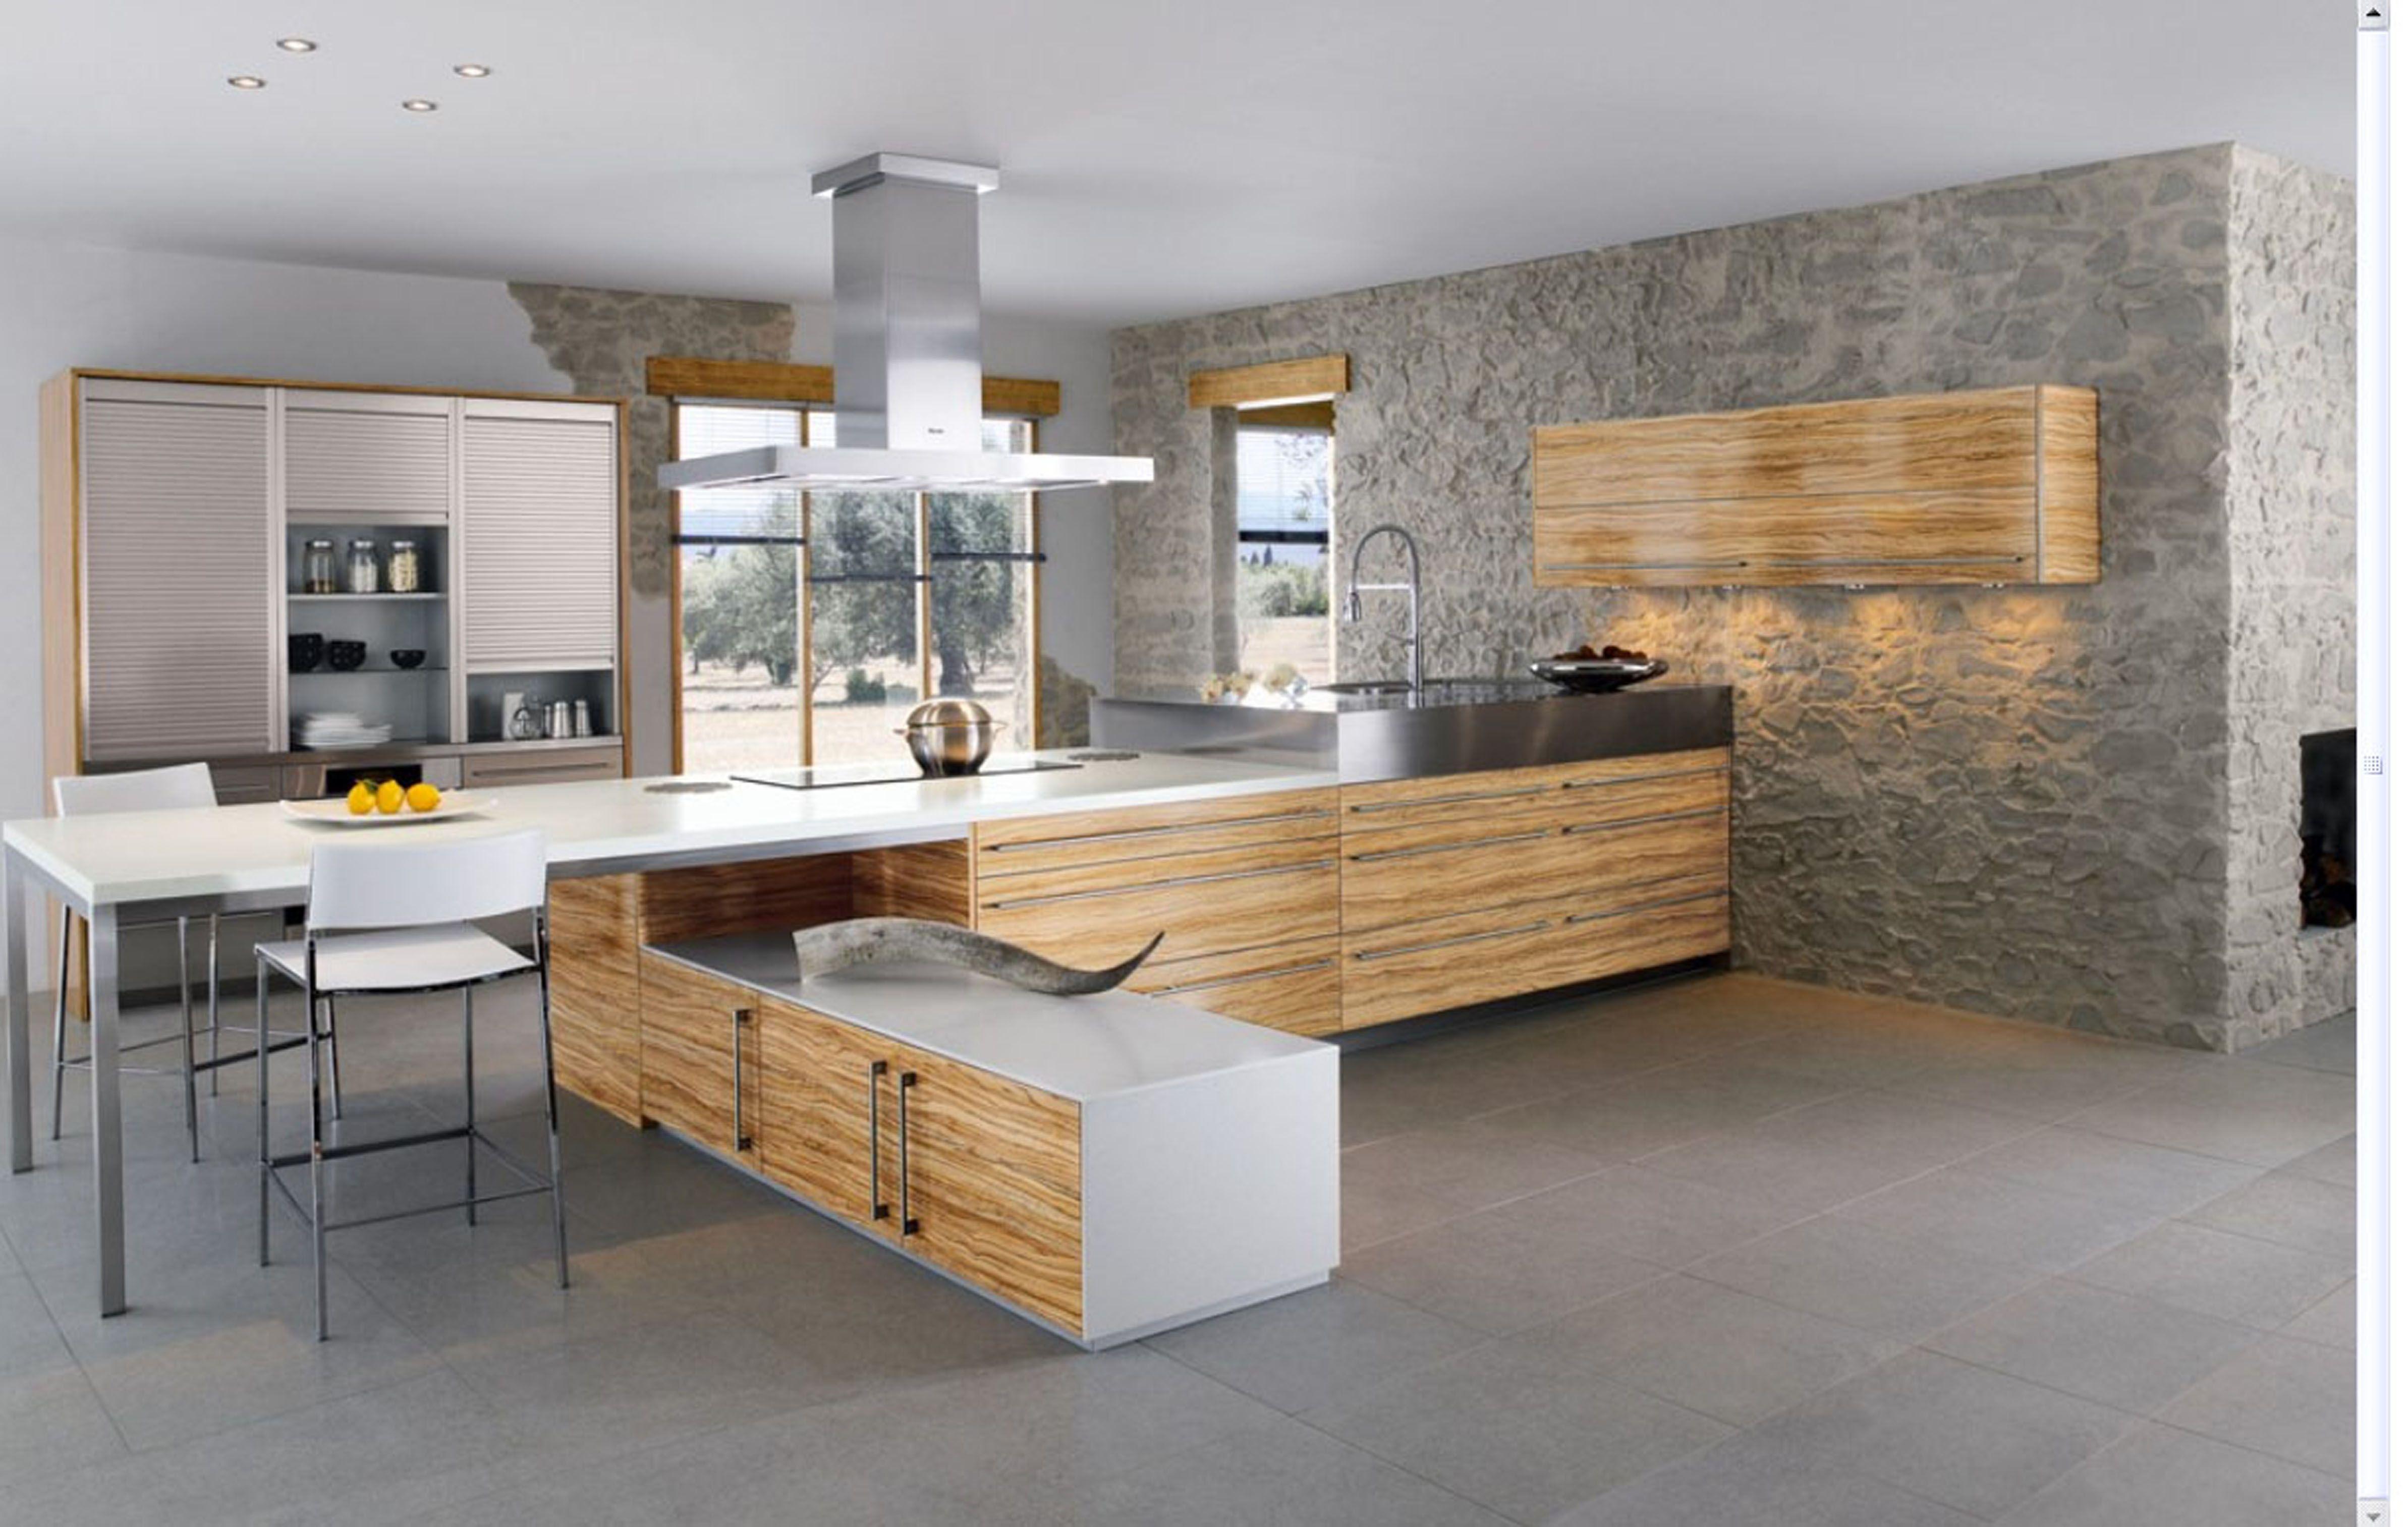 Condo Kitchen Design Ideas Small Kitchen Design Ideas Gallery Large